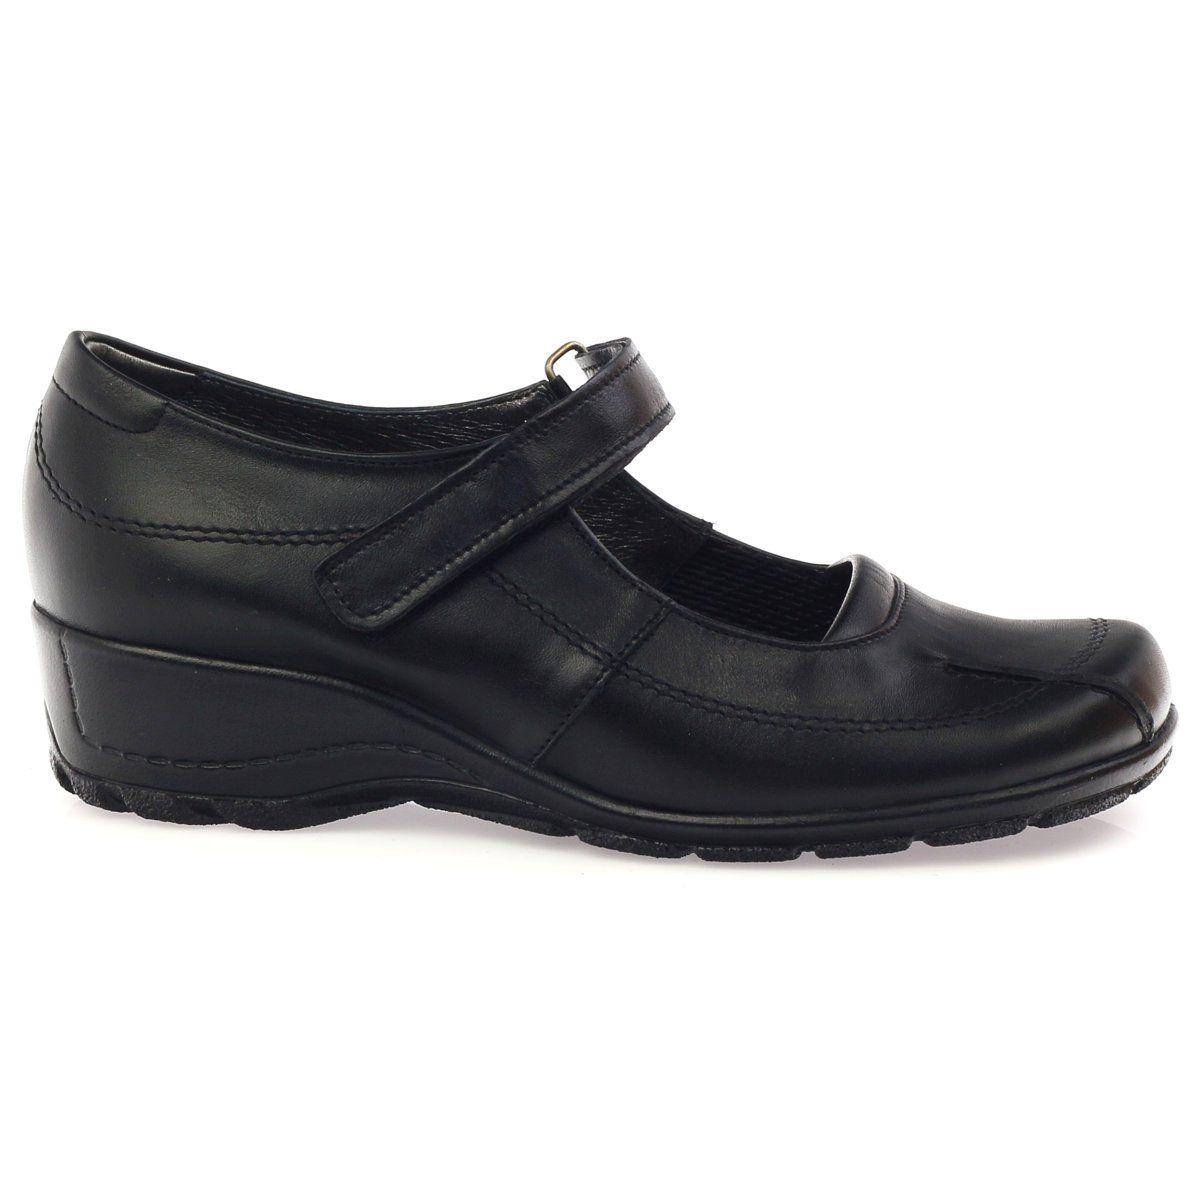 Angello Komfortowe Czolenka Na Koturnie Czarne 371 Black Pumps Shoes Women Shoes